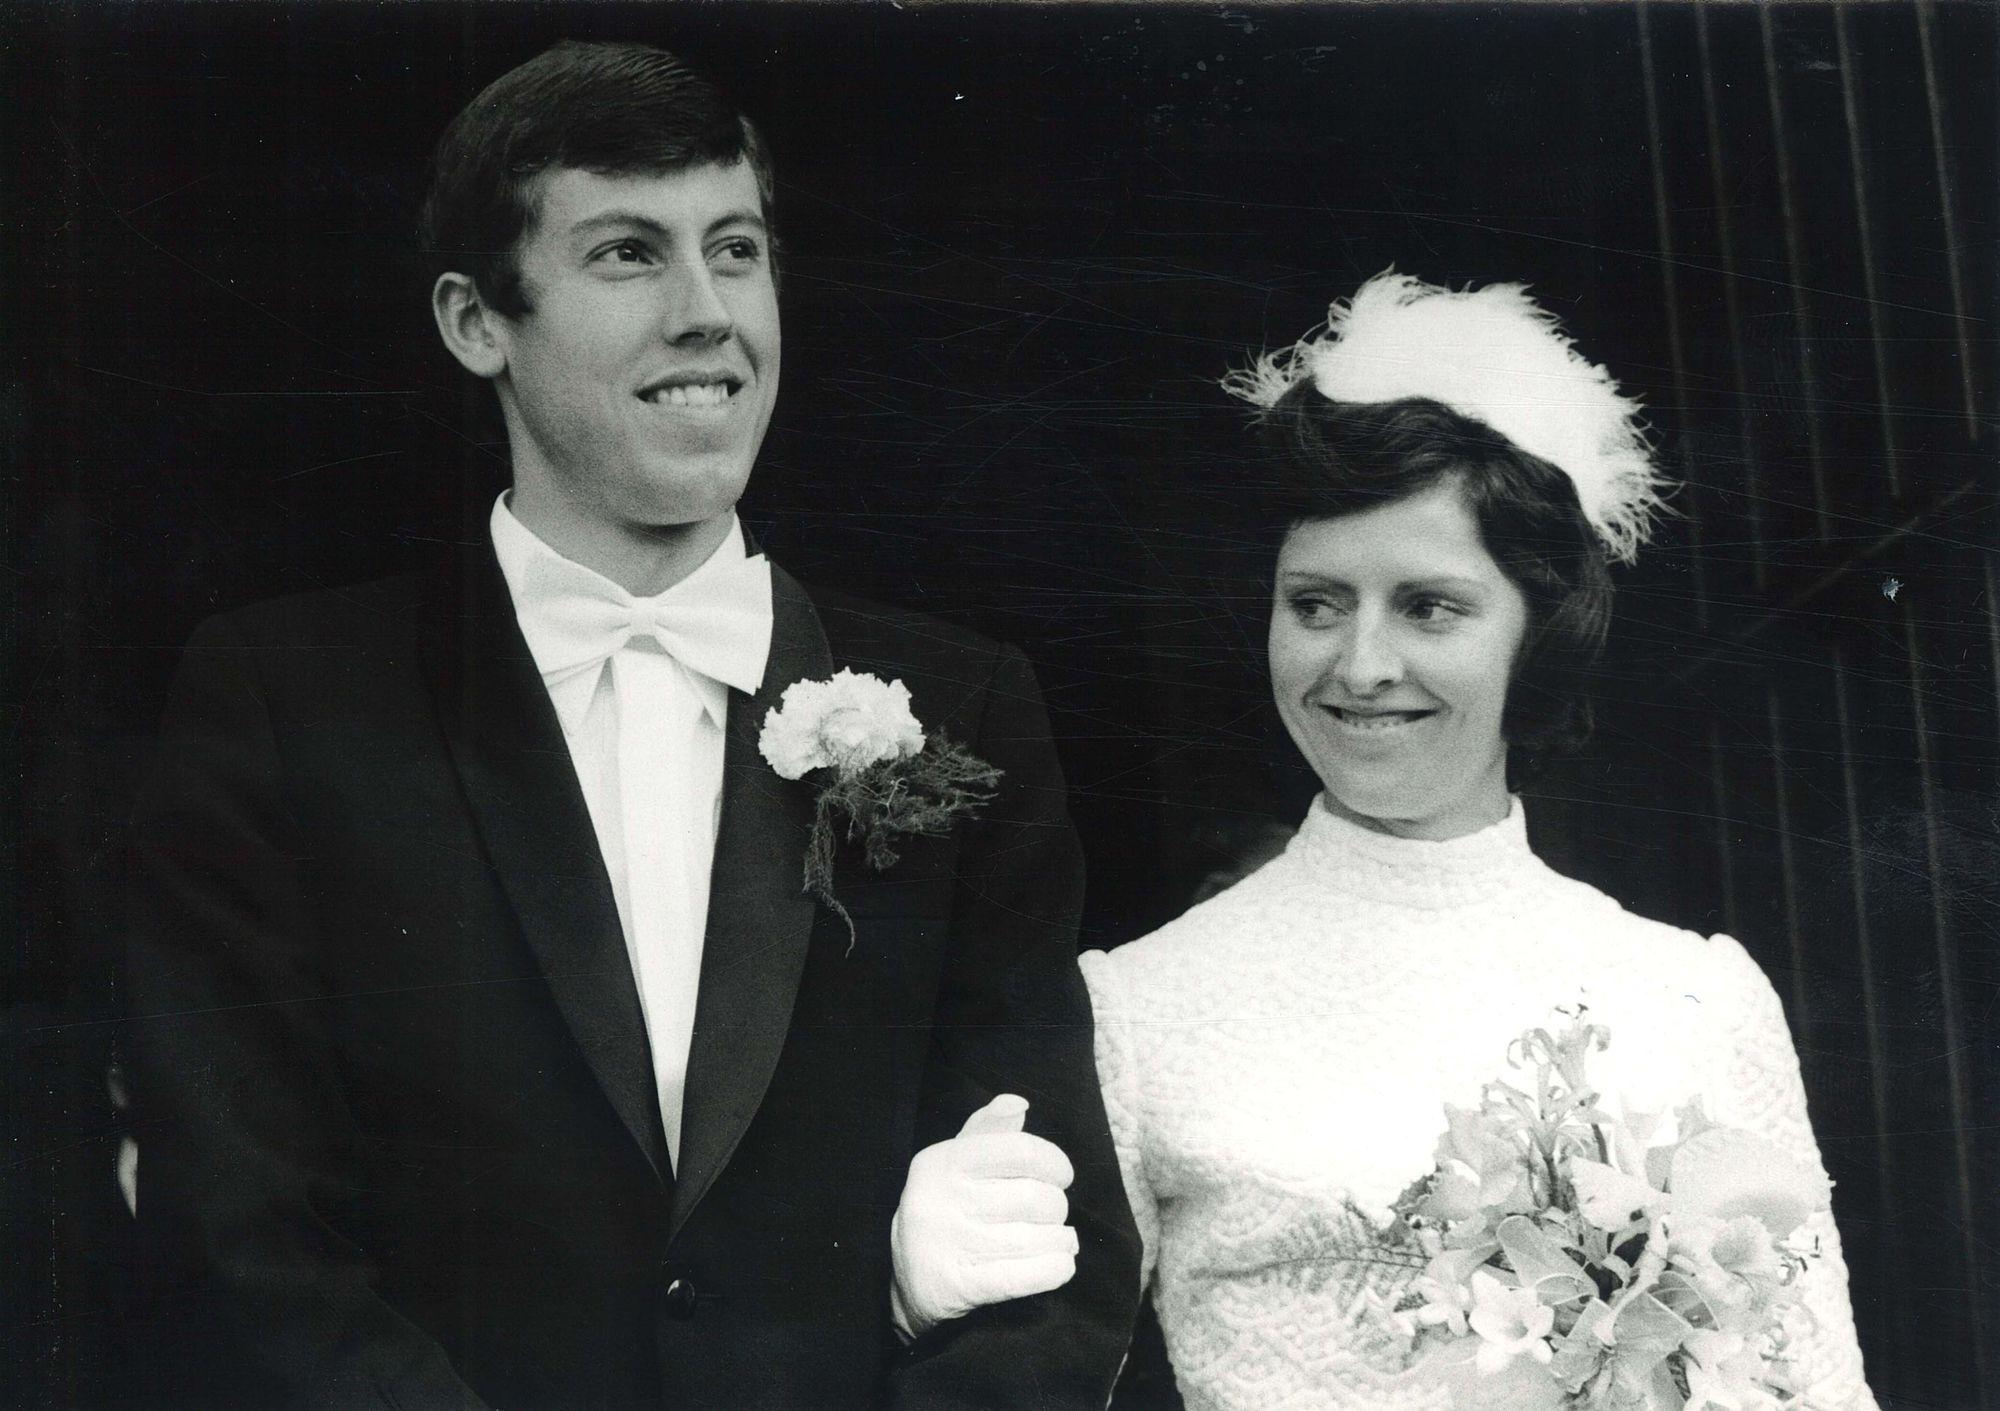 Huwelijk Eric Wyckaert